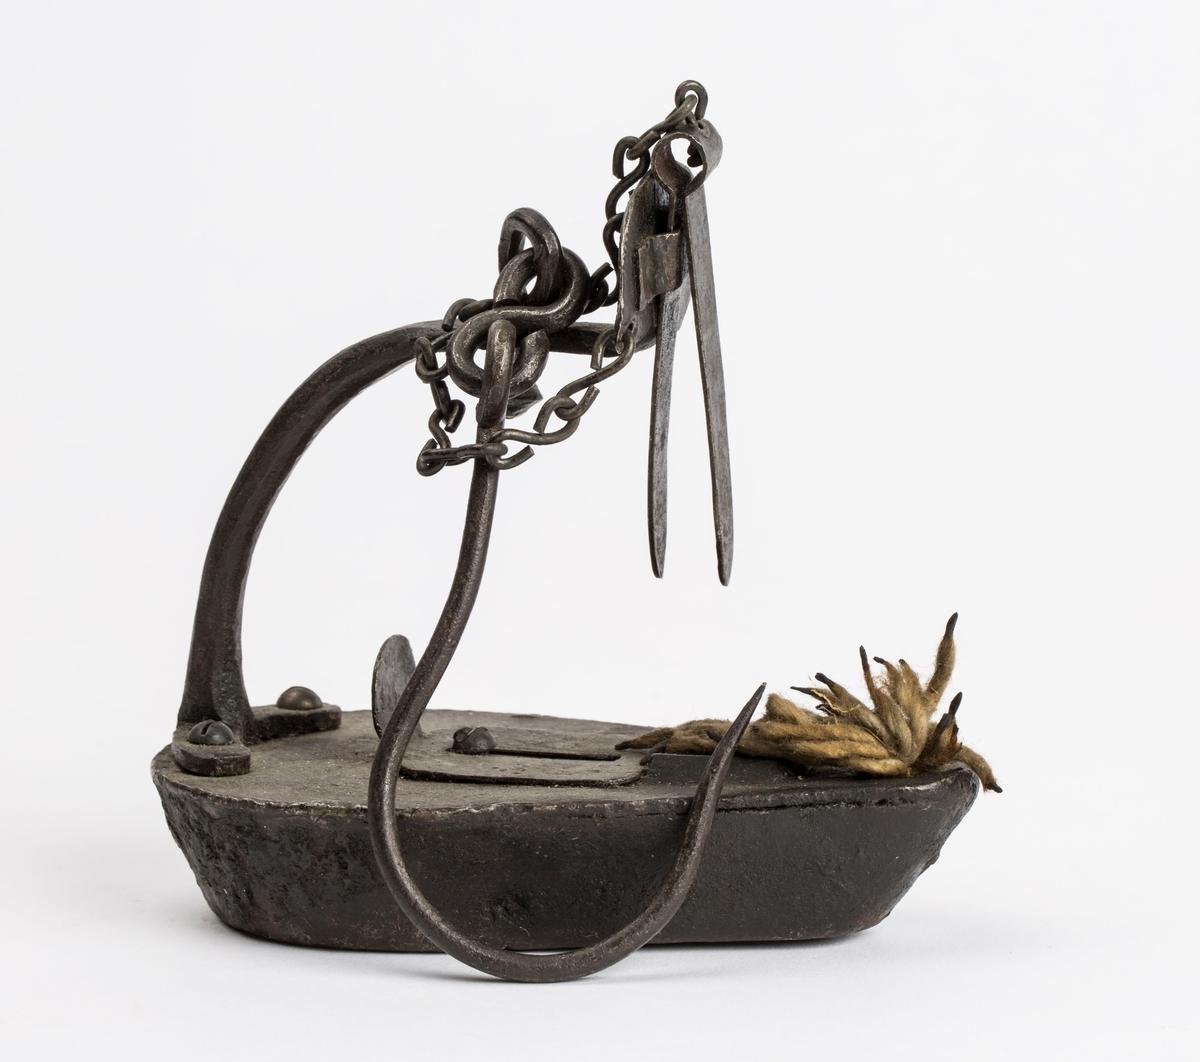 """Gamle grubelamper. Tranlamper. Brennmaterialet var mest alm. fetolje."" NTM: "" 2 stk. i museet        1 stk. på museumsloftet. Disse gruvelamper har vært meget anvendt ved Sølvverket inntil carbidlampene kom i 1910. De brant med veke som kom som garn i nøster. Brennmaterialet var fetolje. En tid bruktes også tran eller vrakolje."" Jf. BVM 126."